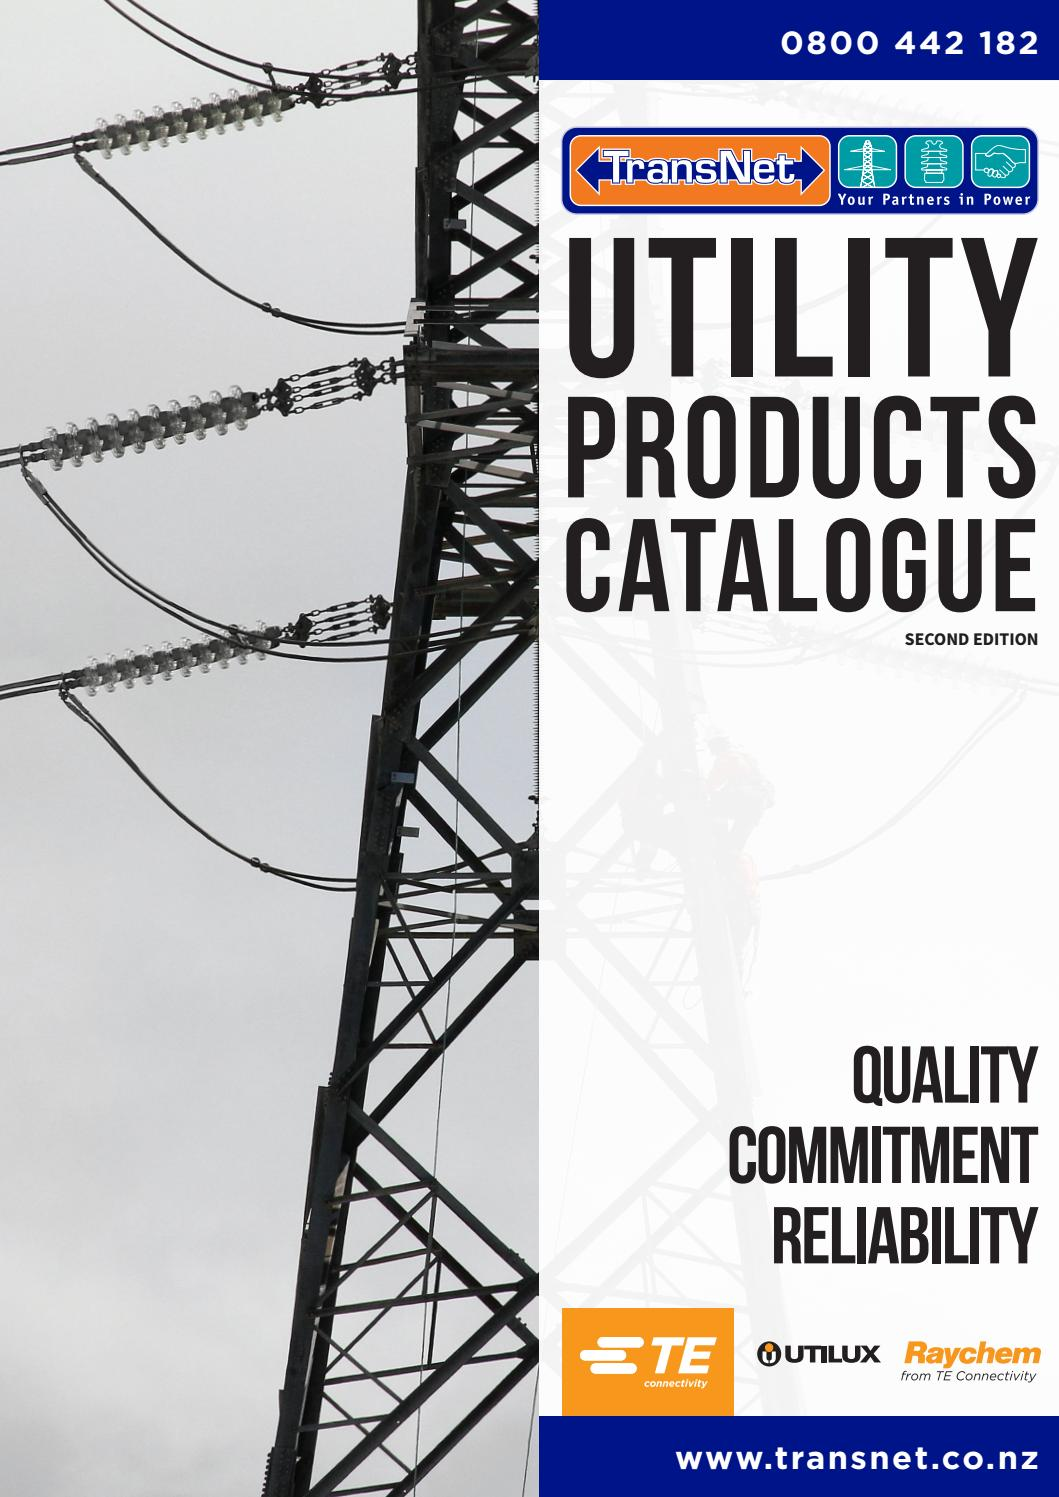 Transnet Nz Ltd Utility Products Catalogue 2018 Second Edition By Transnet Nz Ltd Issuu